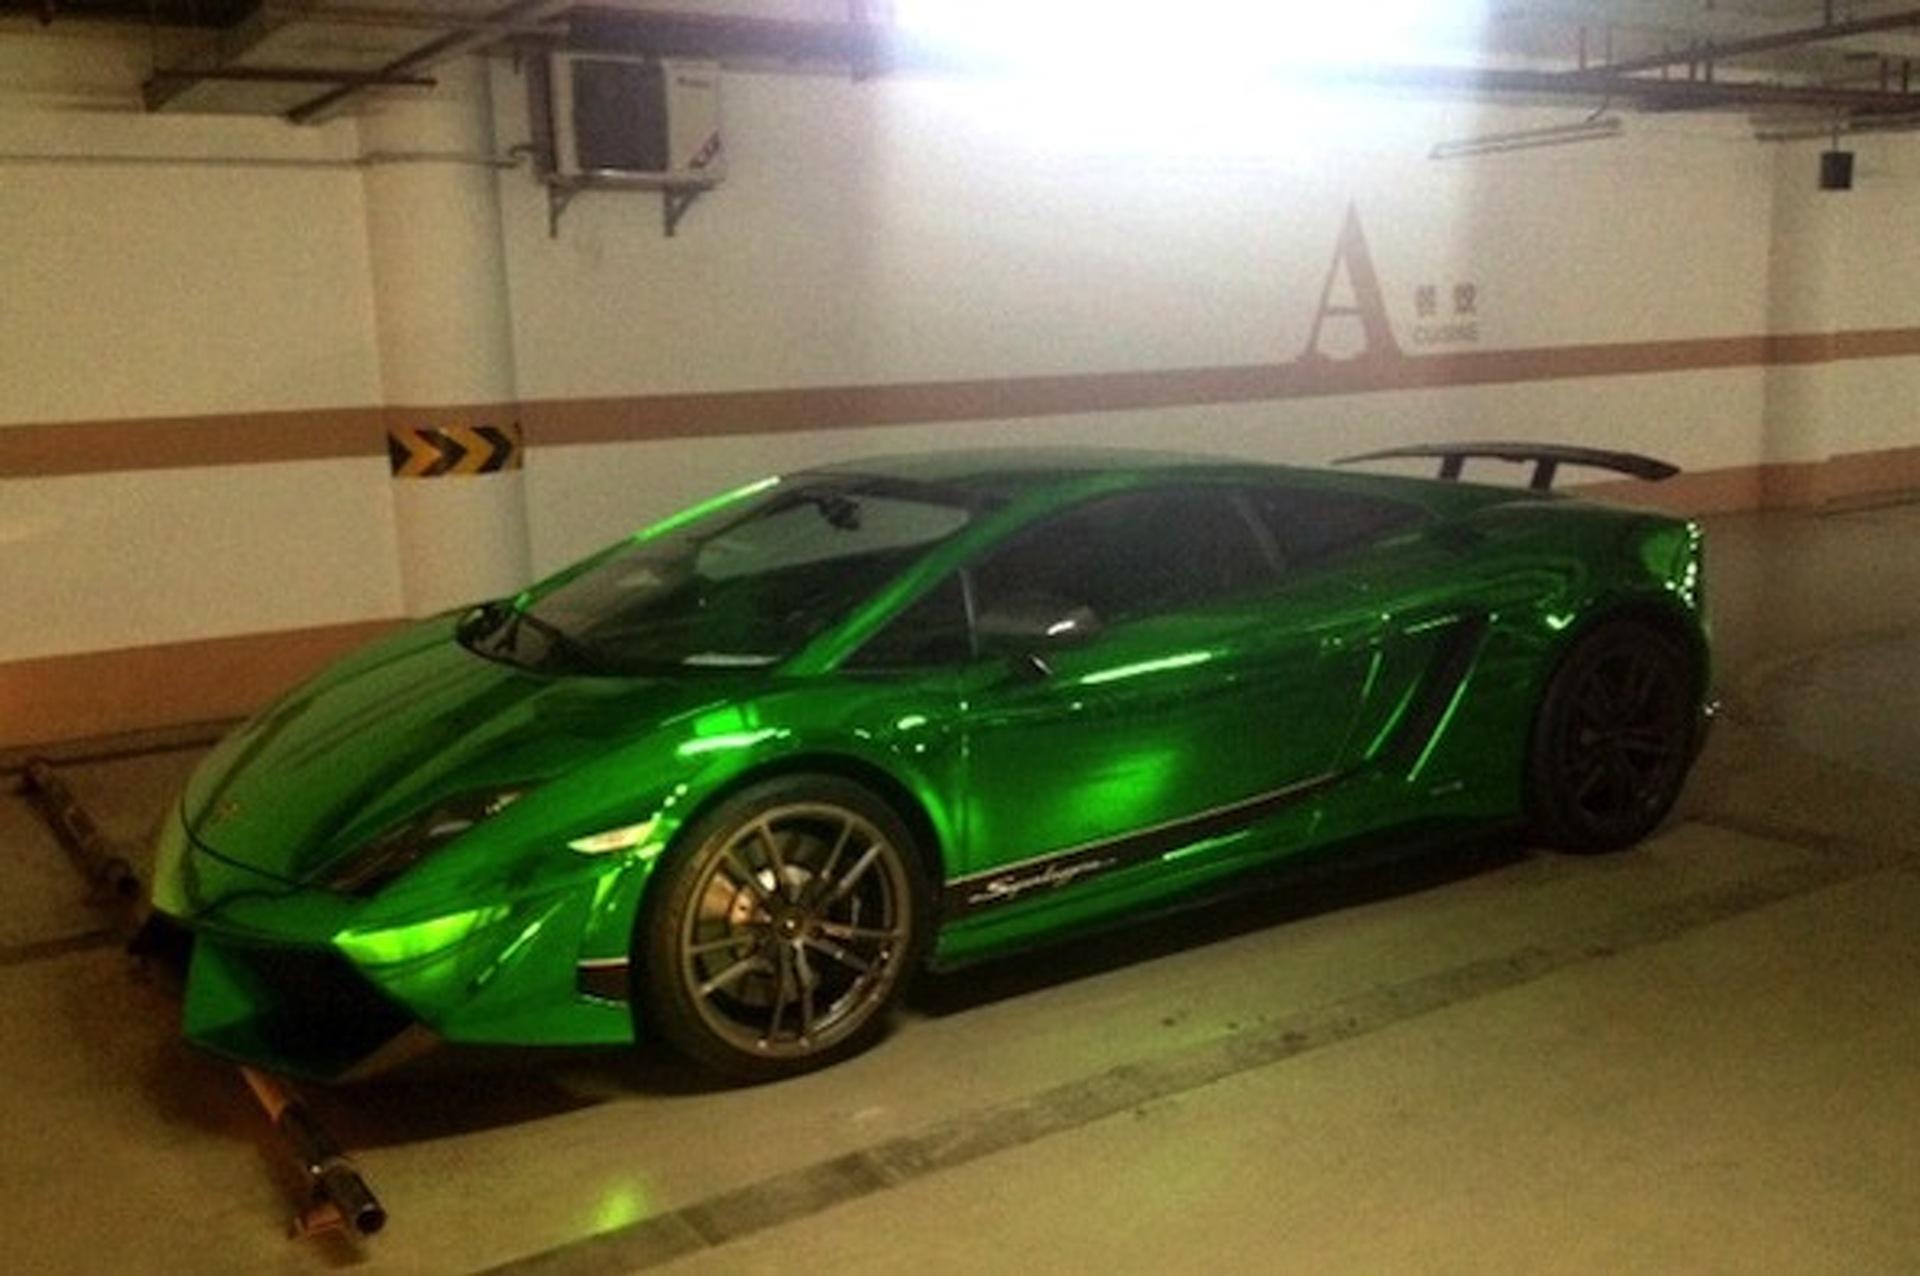 Chinese Lamborghini Gallardo Superleggera Wrapped in Chrome Green